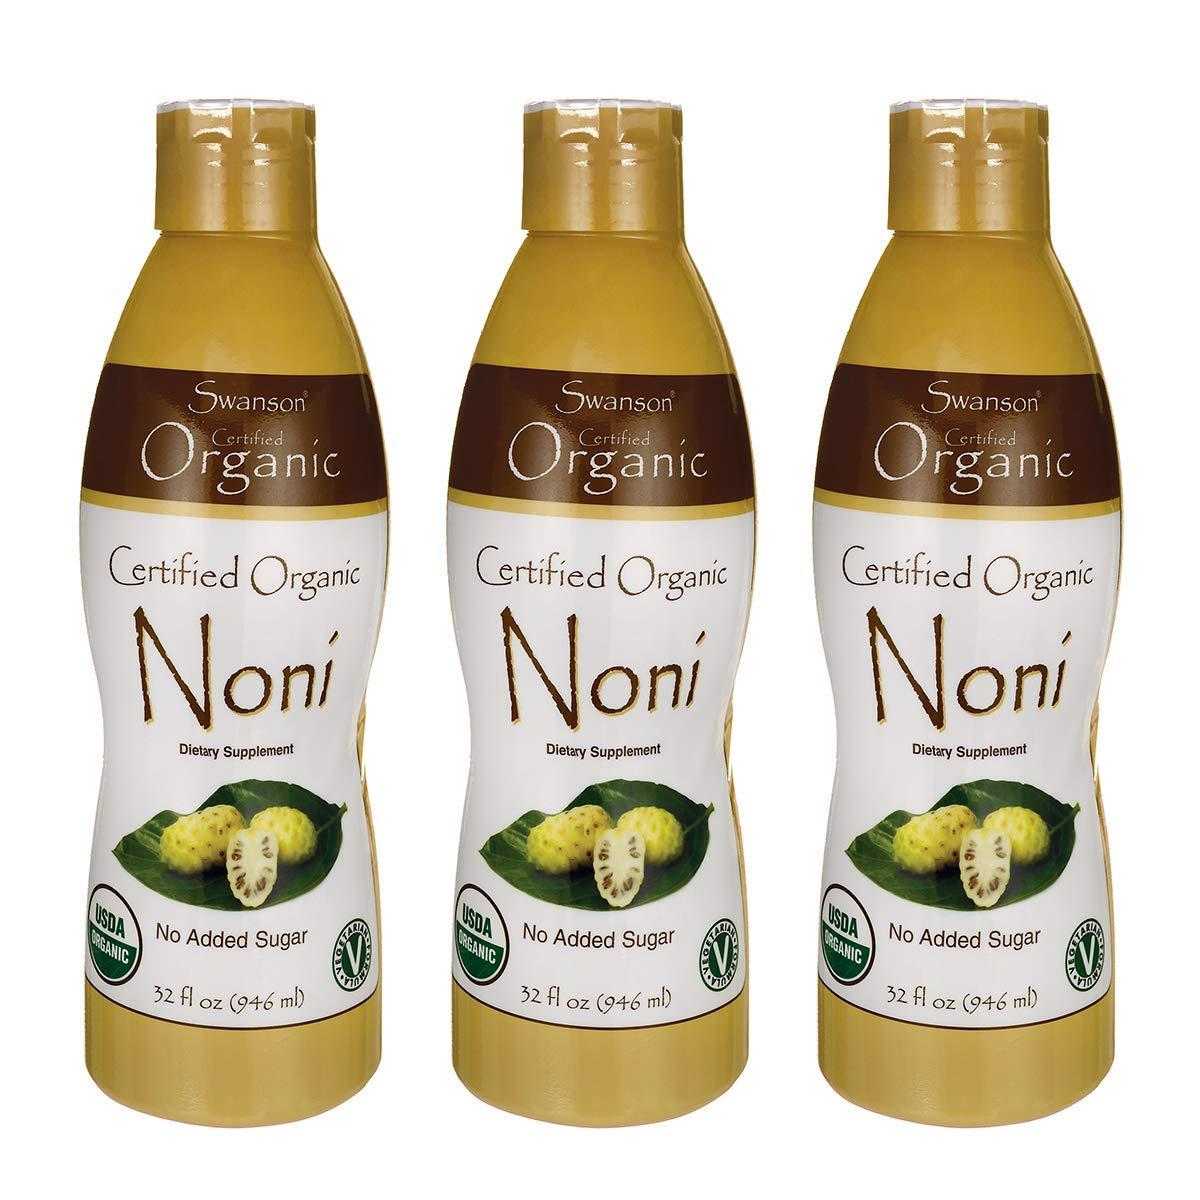 Swanson Certified Organic Noni 32 fl Ounce (1 qt) (946 ml) Liquid (3 Pack)